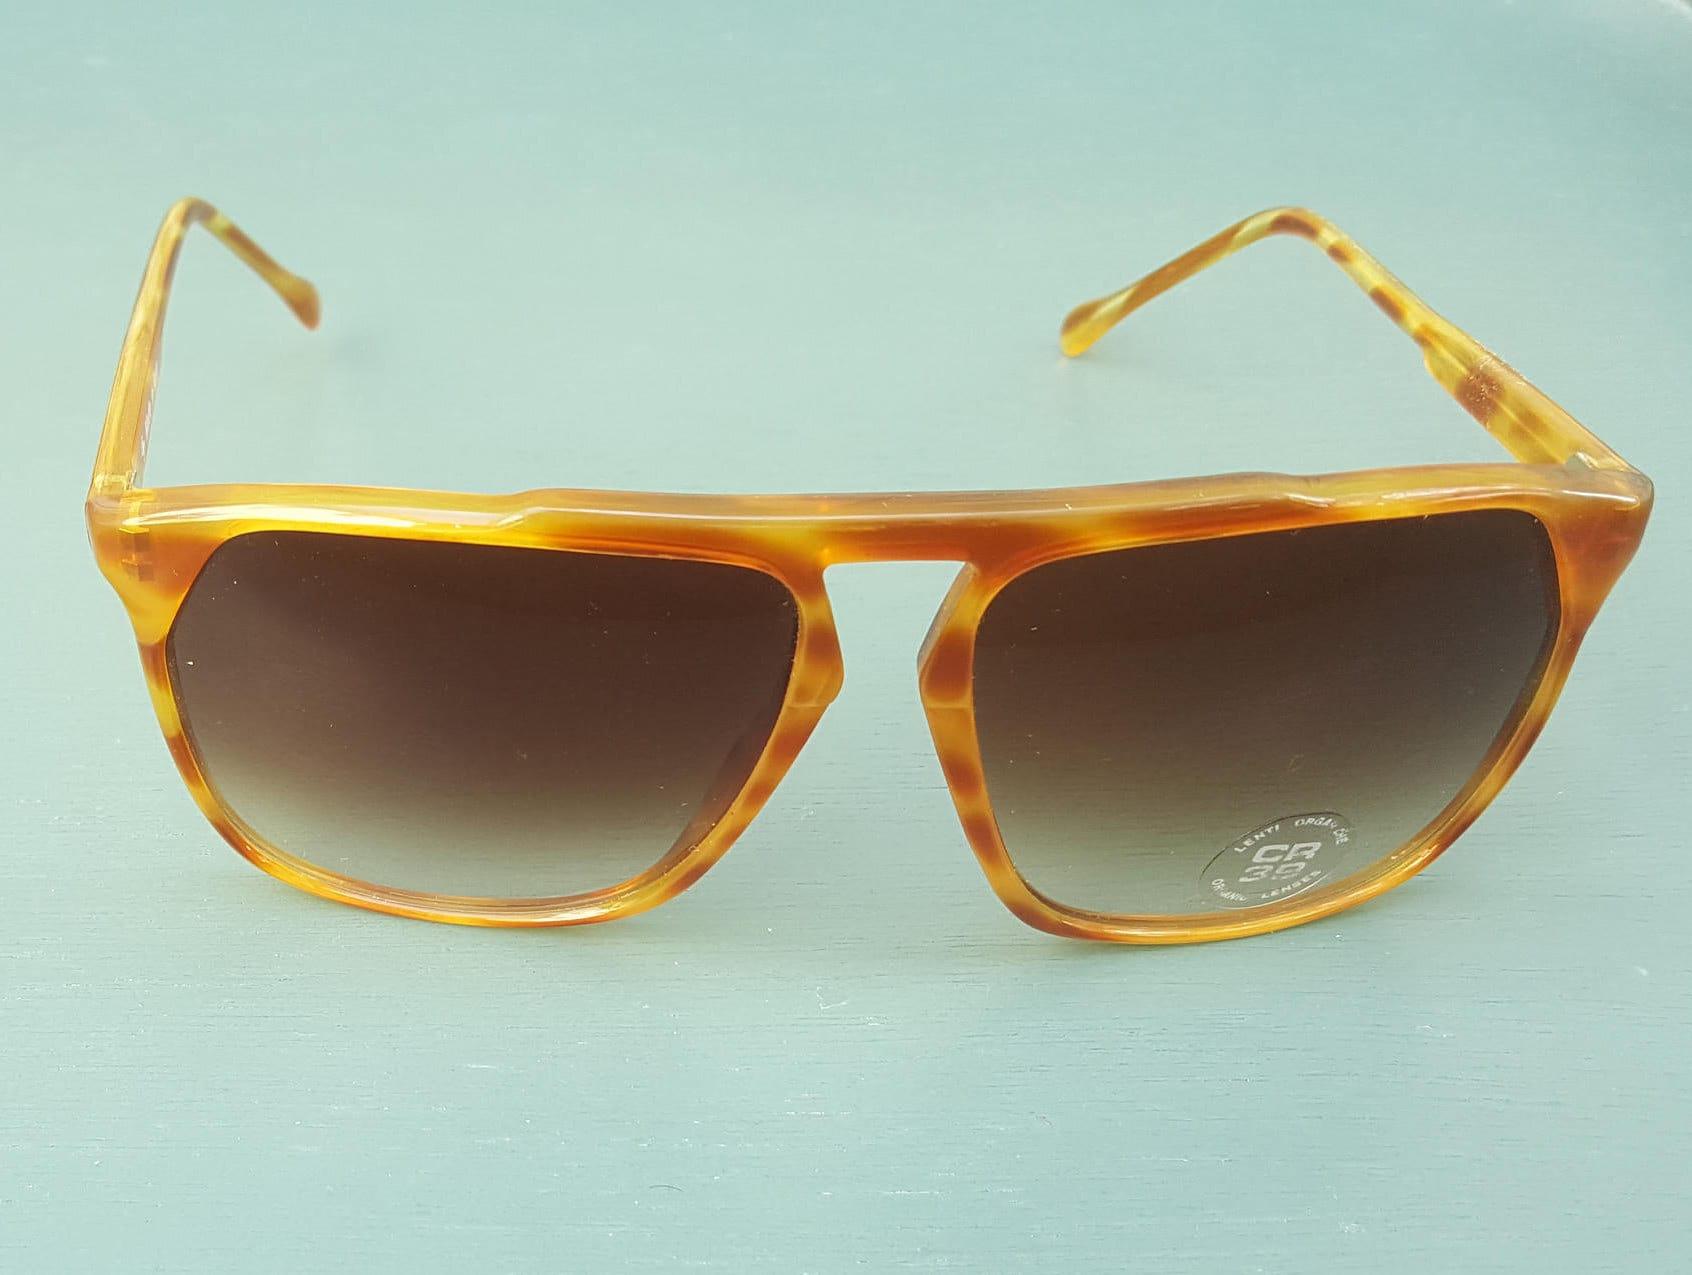 Sunglasses? , Sunglasses & Eyewear , Accessories